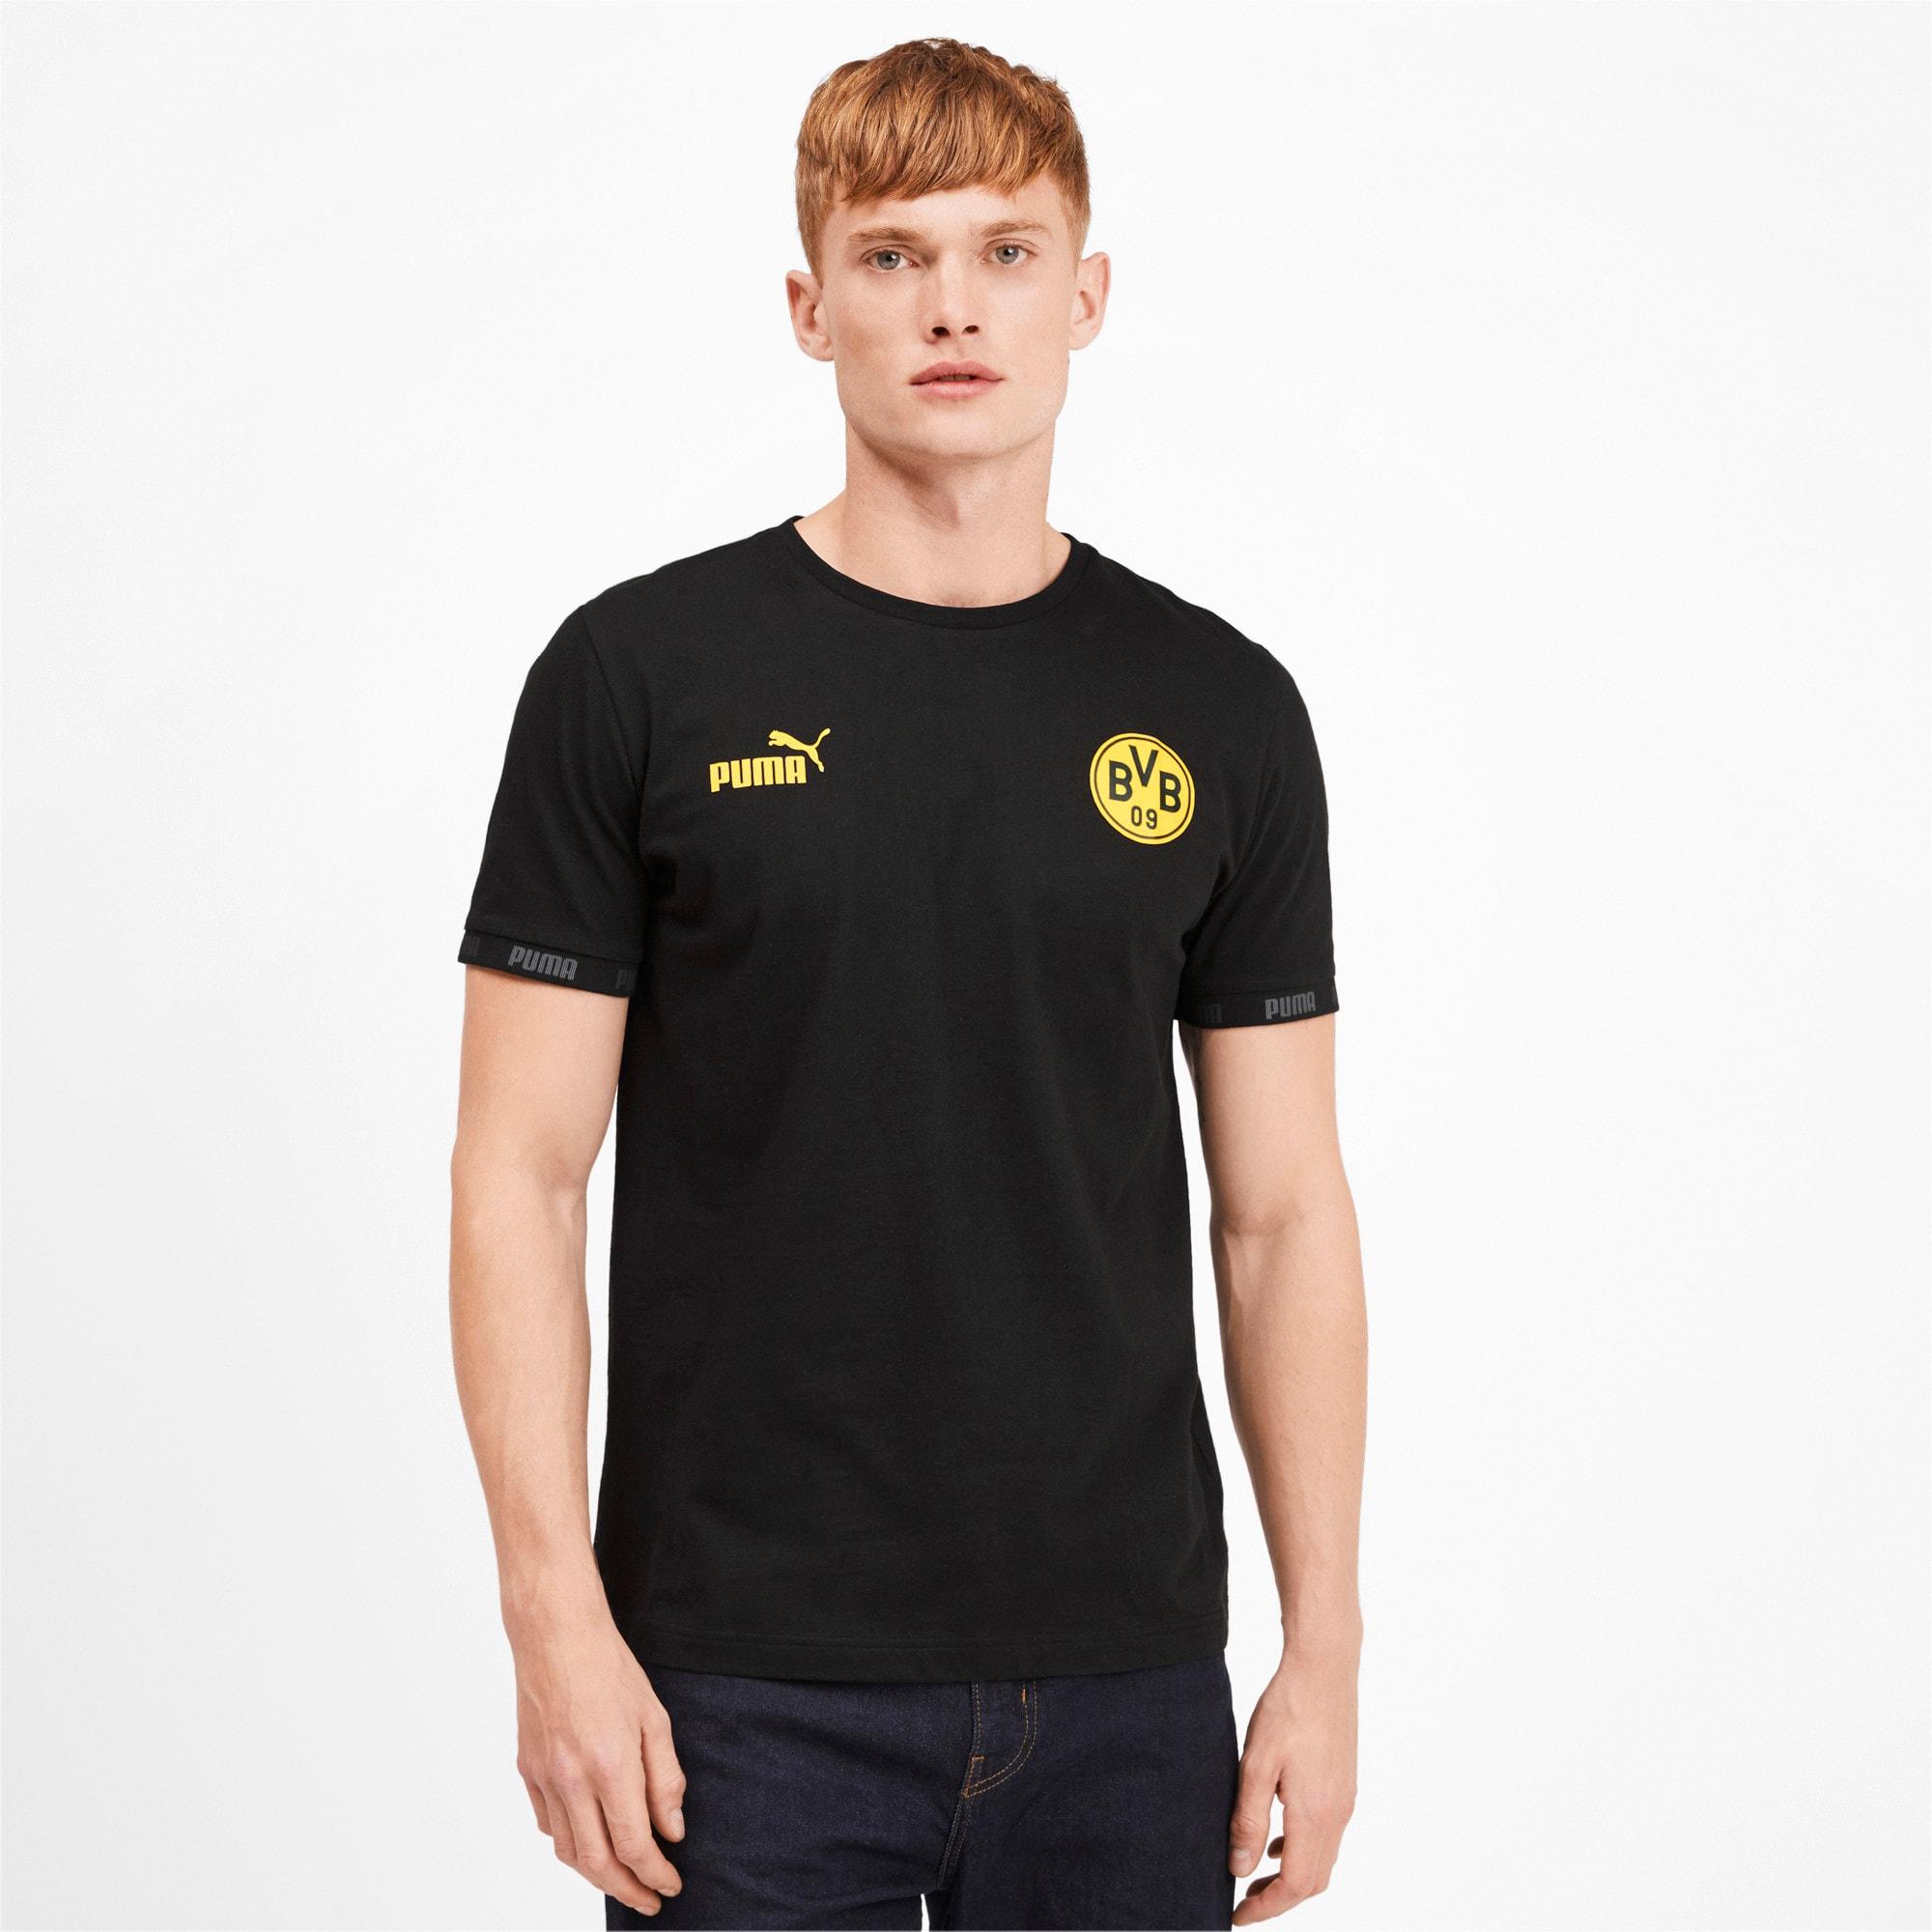 Thumbnail 1 of BVB Football Culture Men's Tee, Puma Black, medium